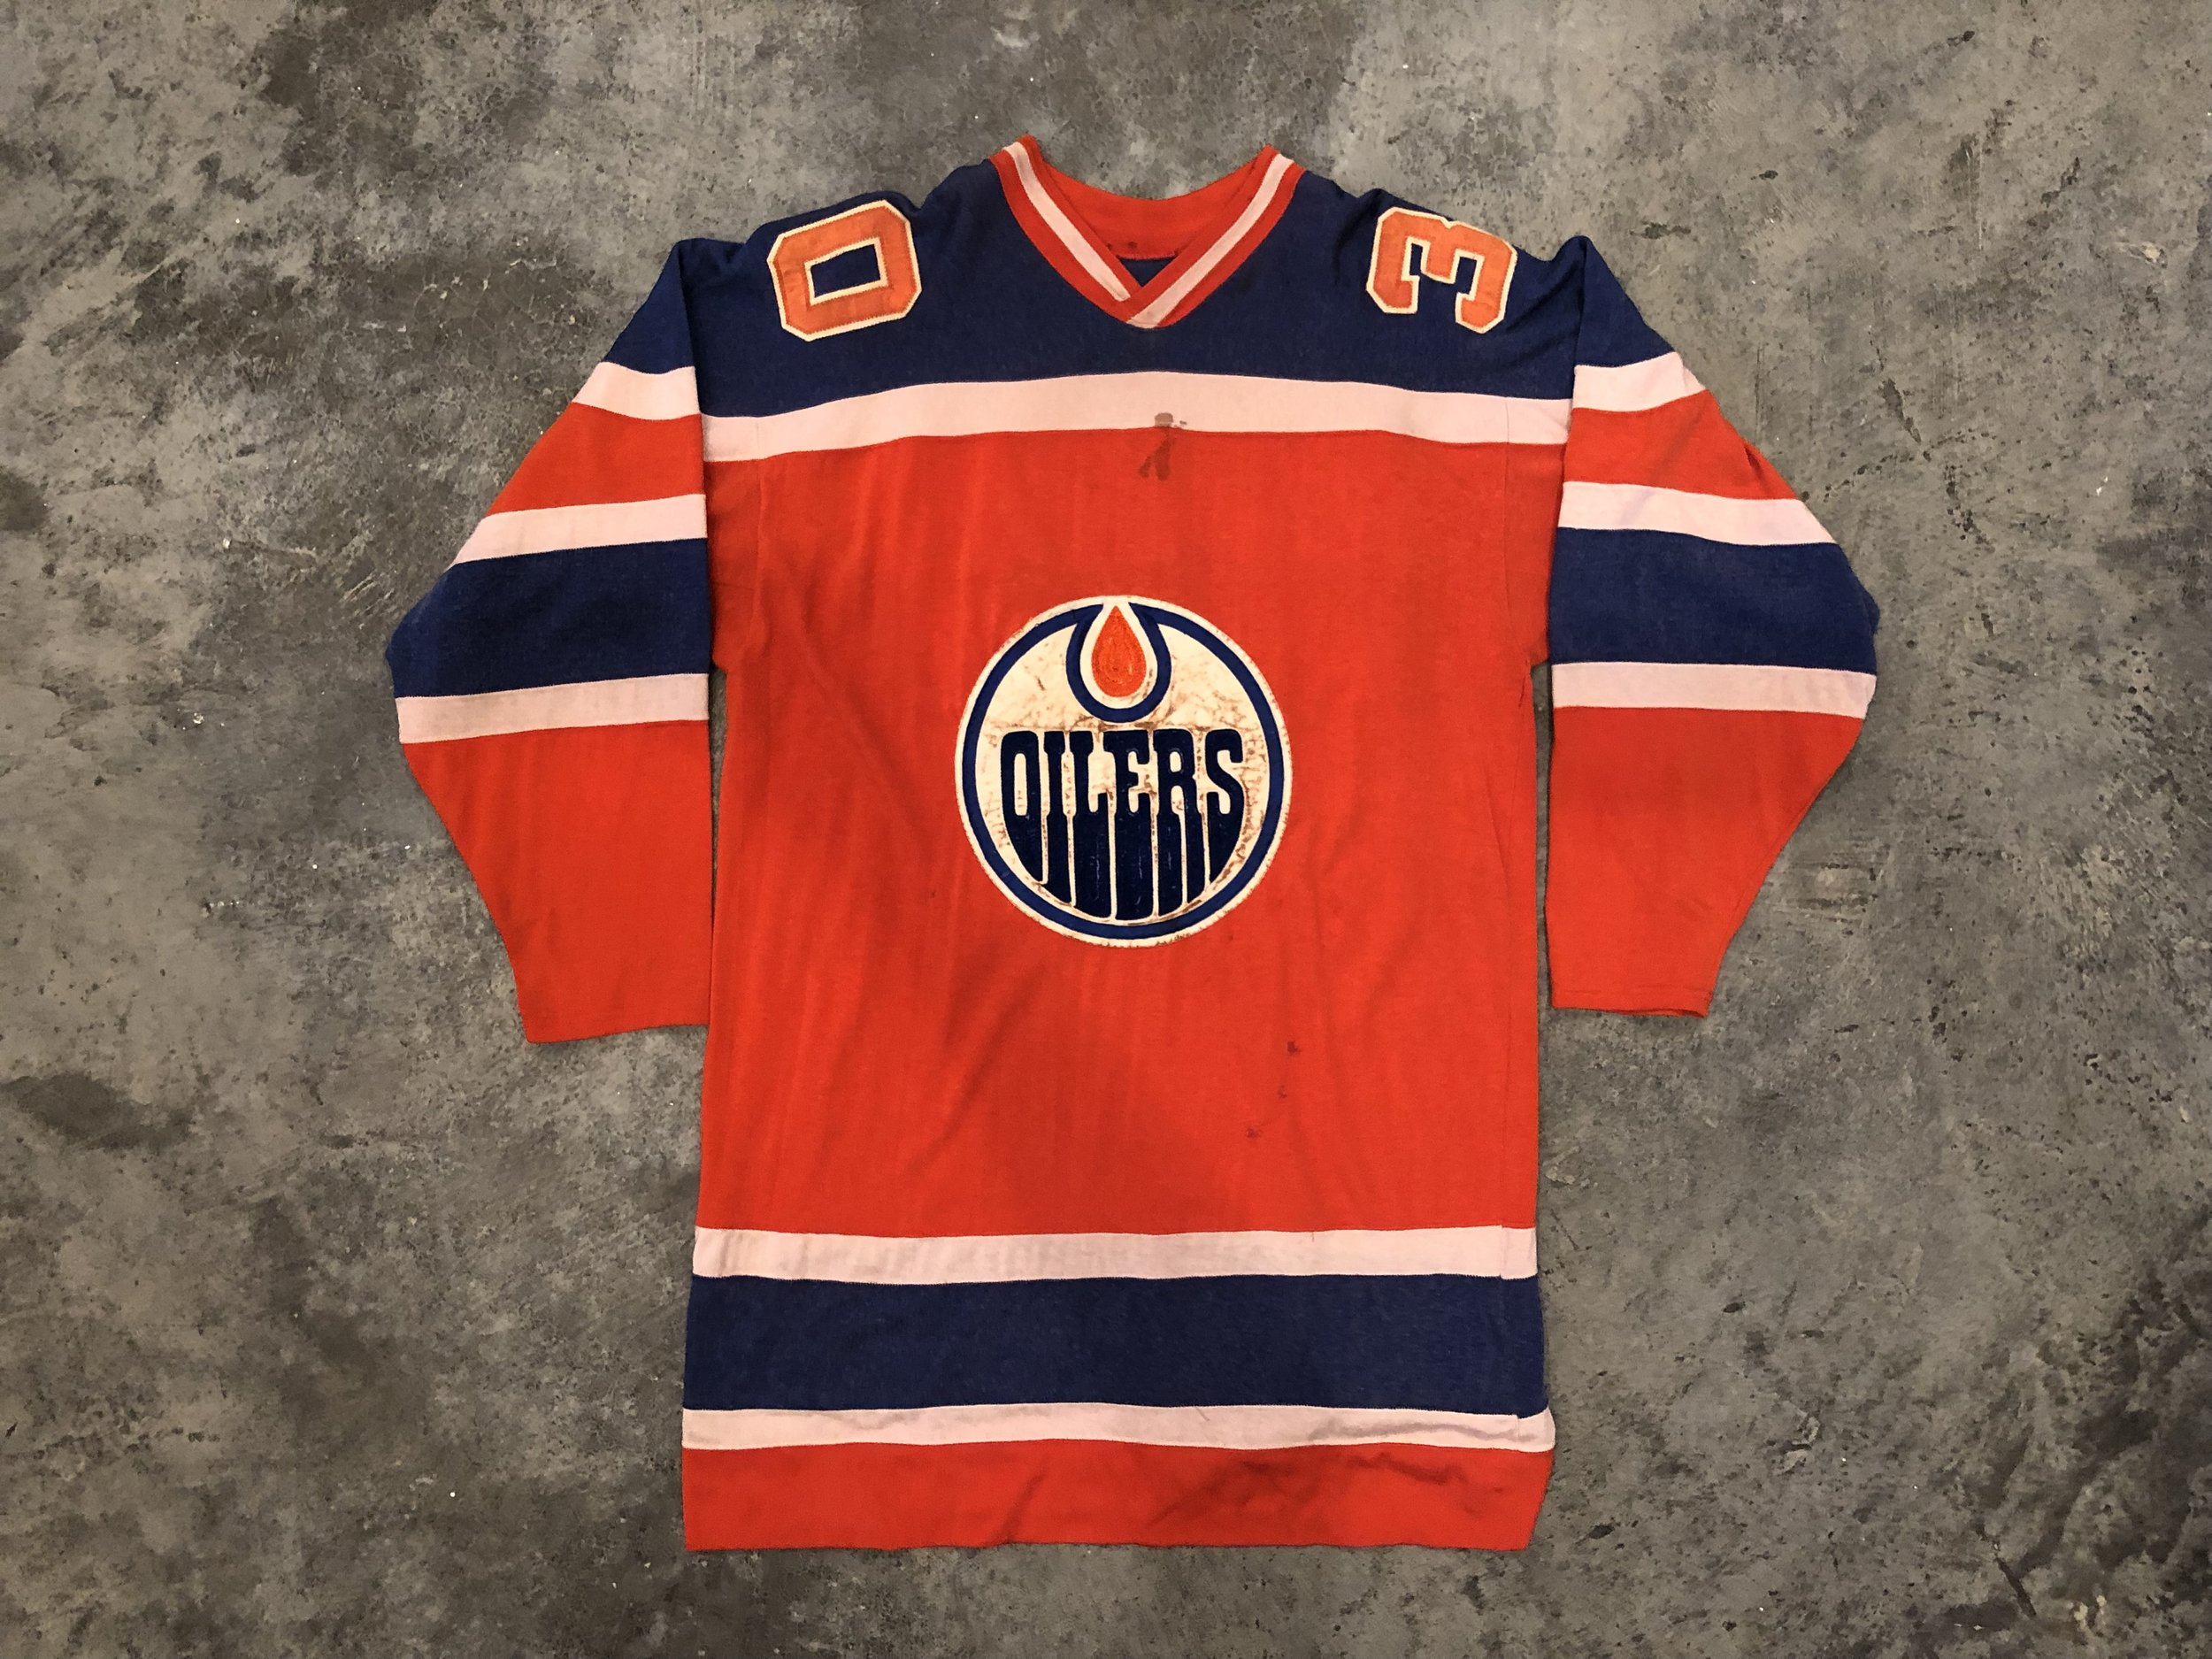 Jacques Plante Edmonton Oilers WHA Game Worn Jersey - 1956, 1957, 1958, 1959, 1960, 1962 & 1969 Vezina Winner